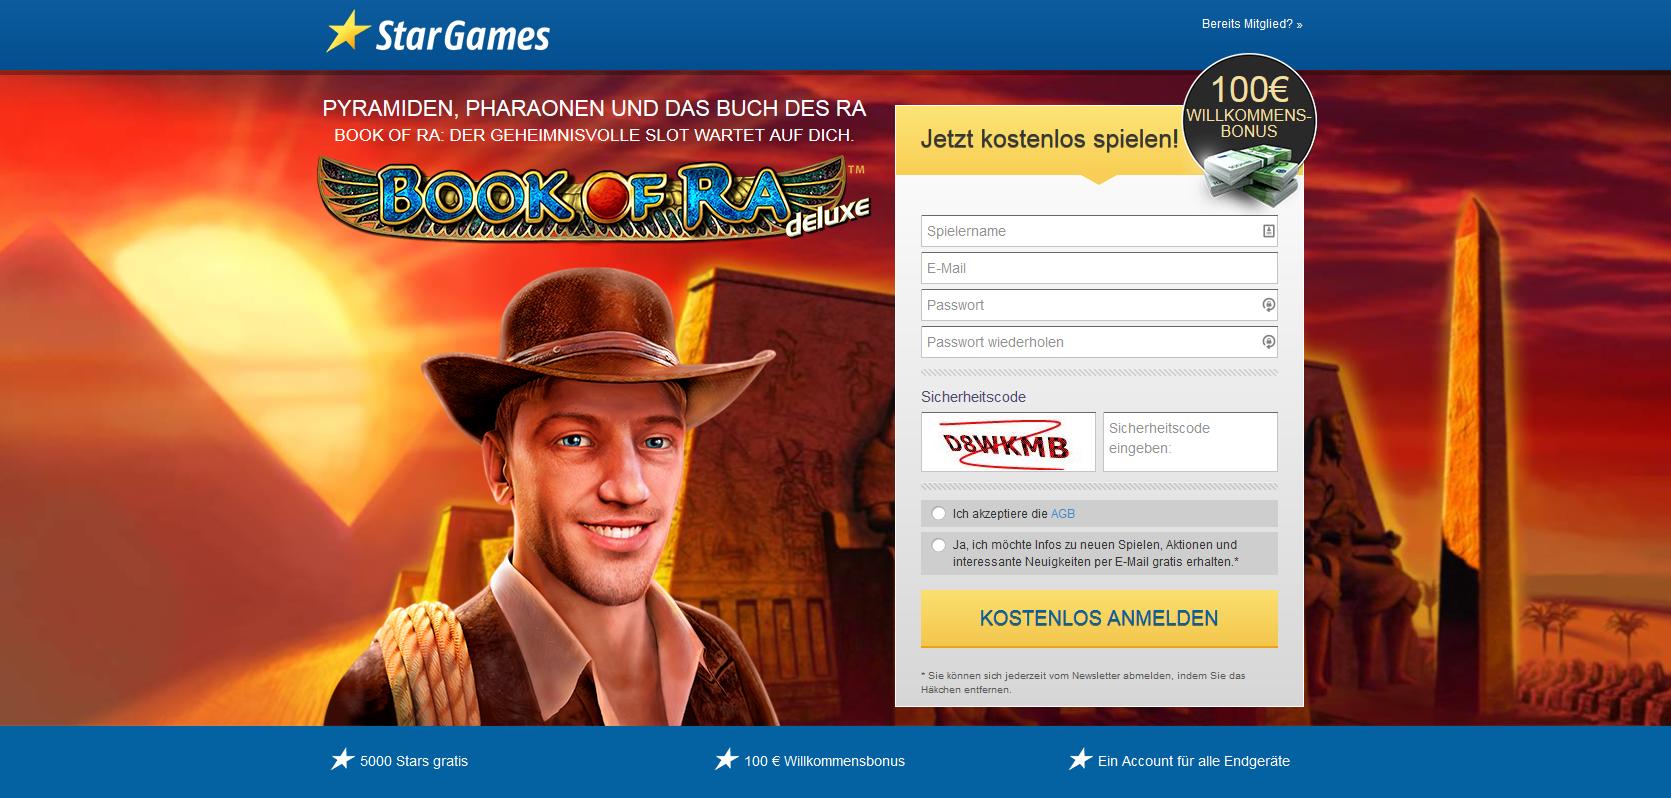 Stargames Erfahrung - Das Original Stargames Casino